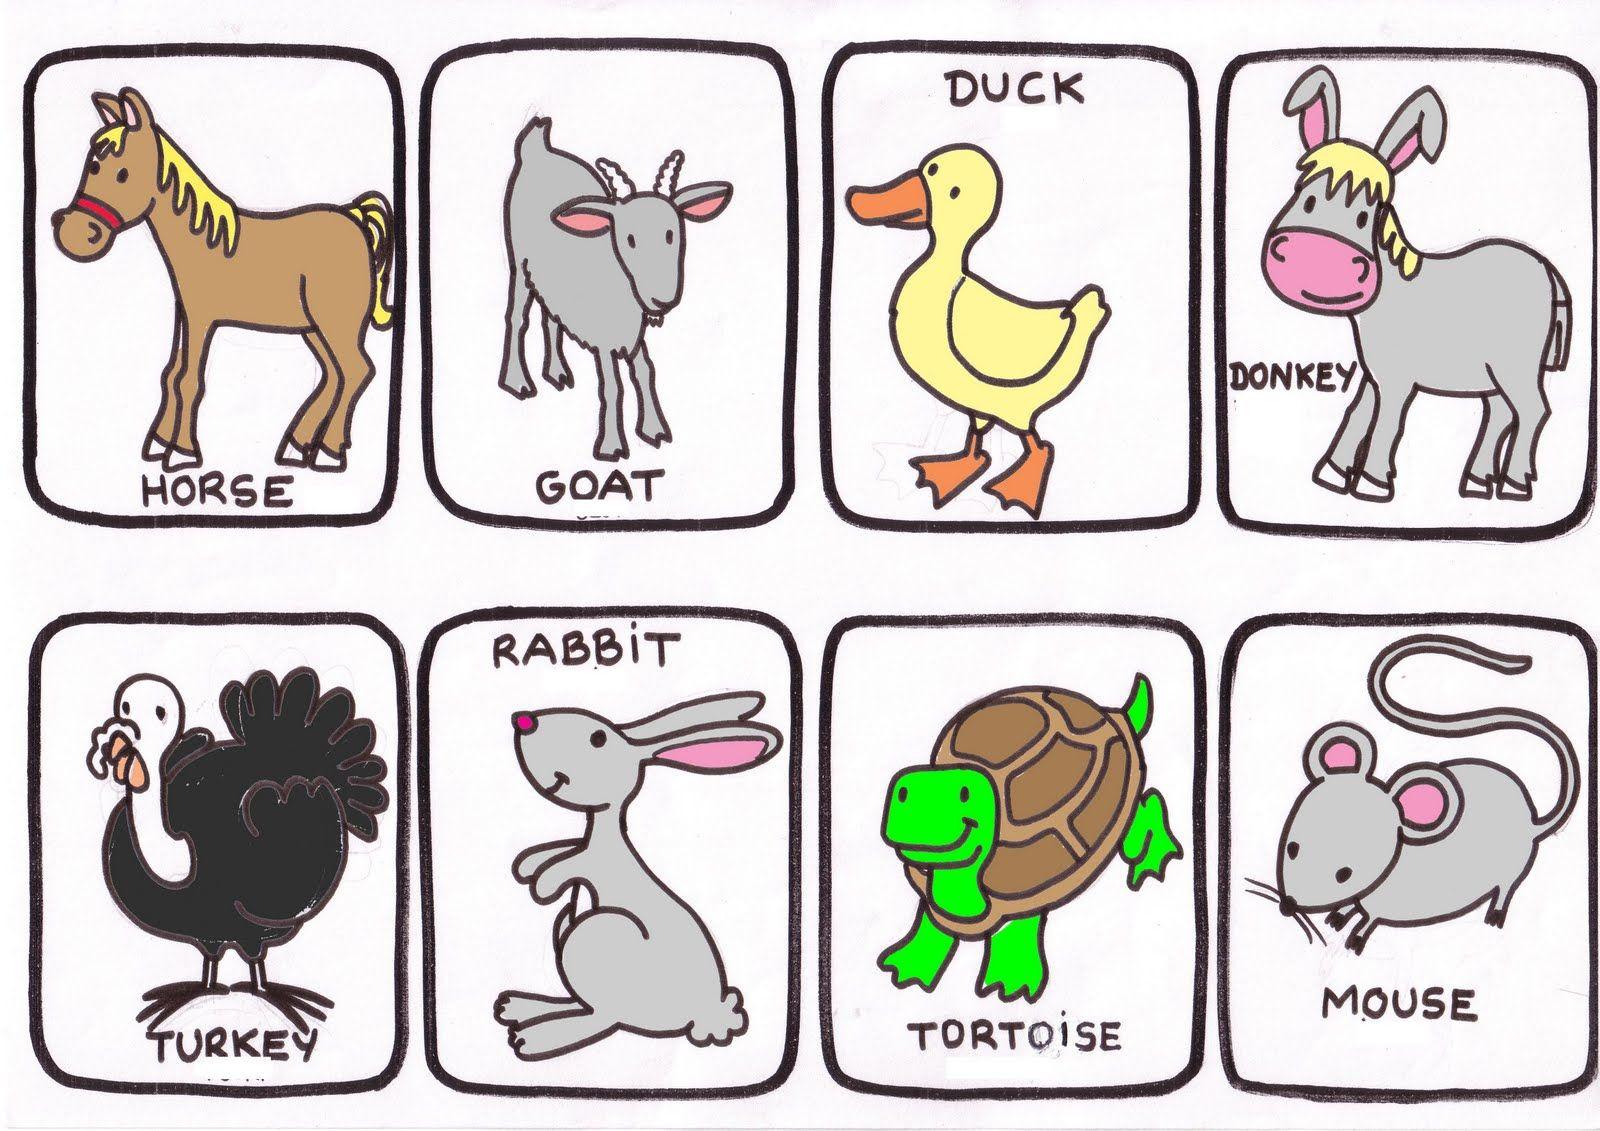 Inglés En Infantil Animales Vocabulario Buscar Con Google Animales En Ingles Granja En Ingles Nombres De Animales